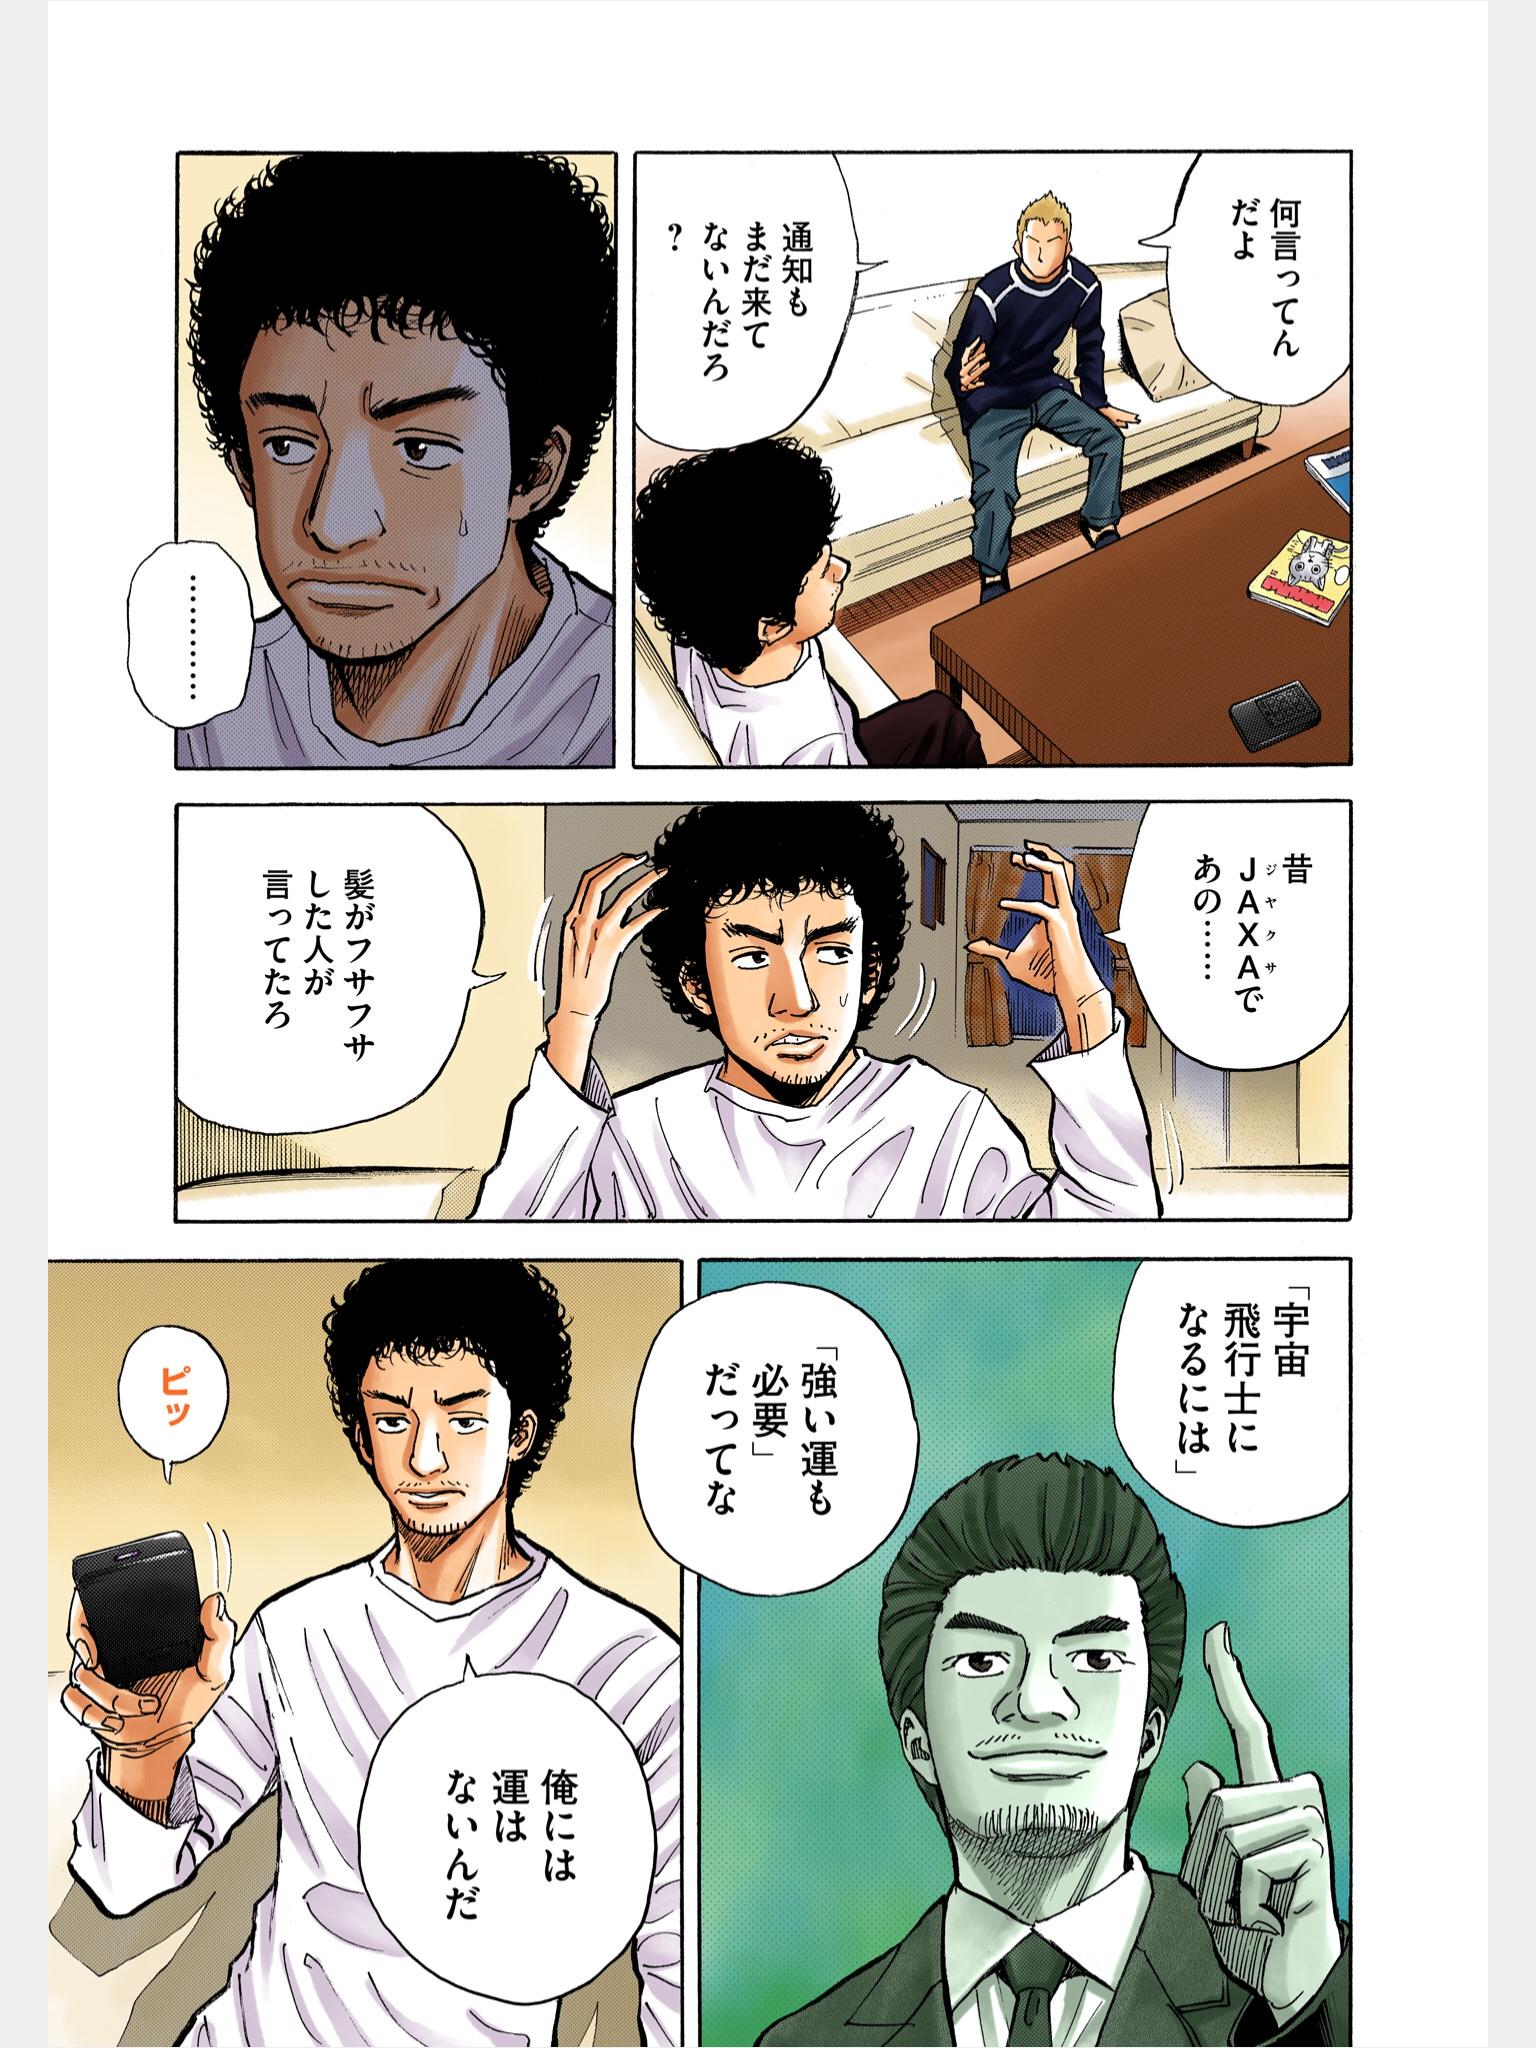 uchukyodai_vol.2_4c_94